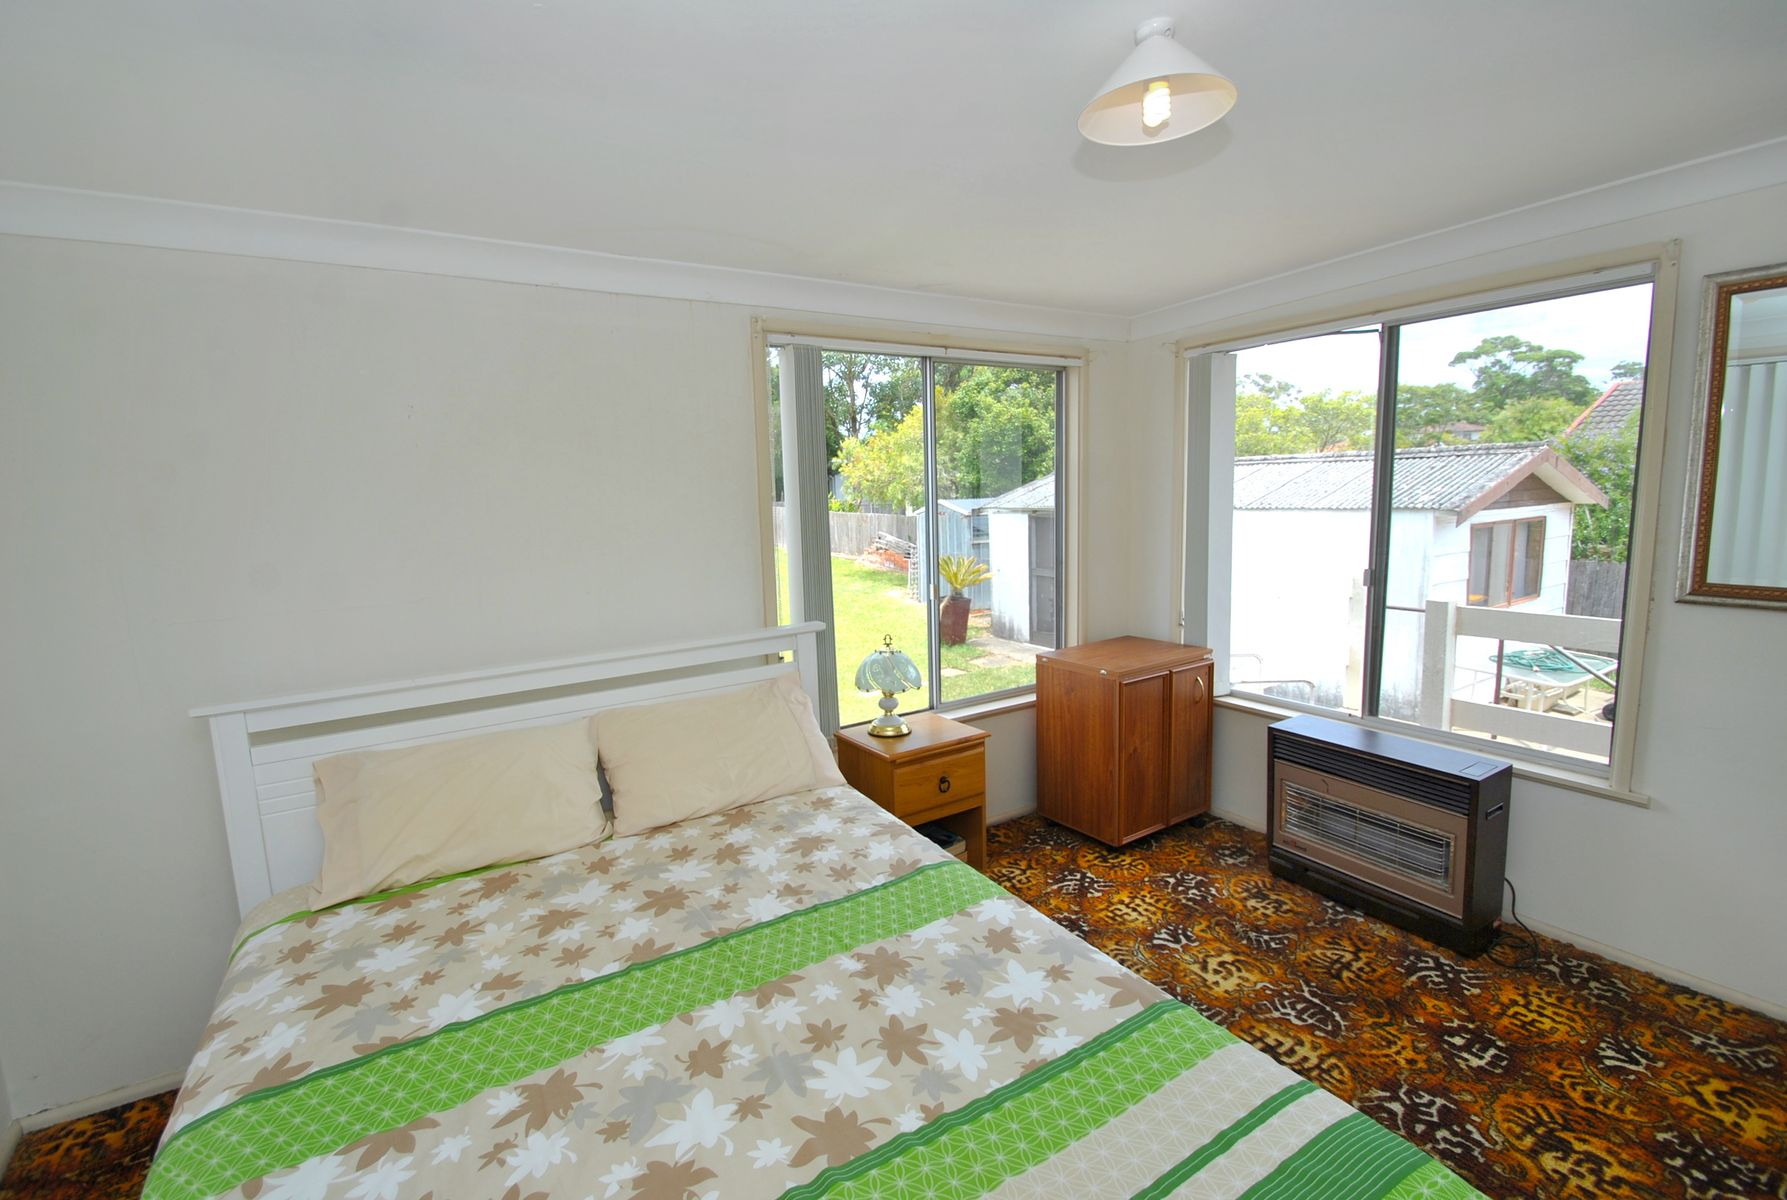 28 The Lake Circuit, Culburra Beach, NSW 2540